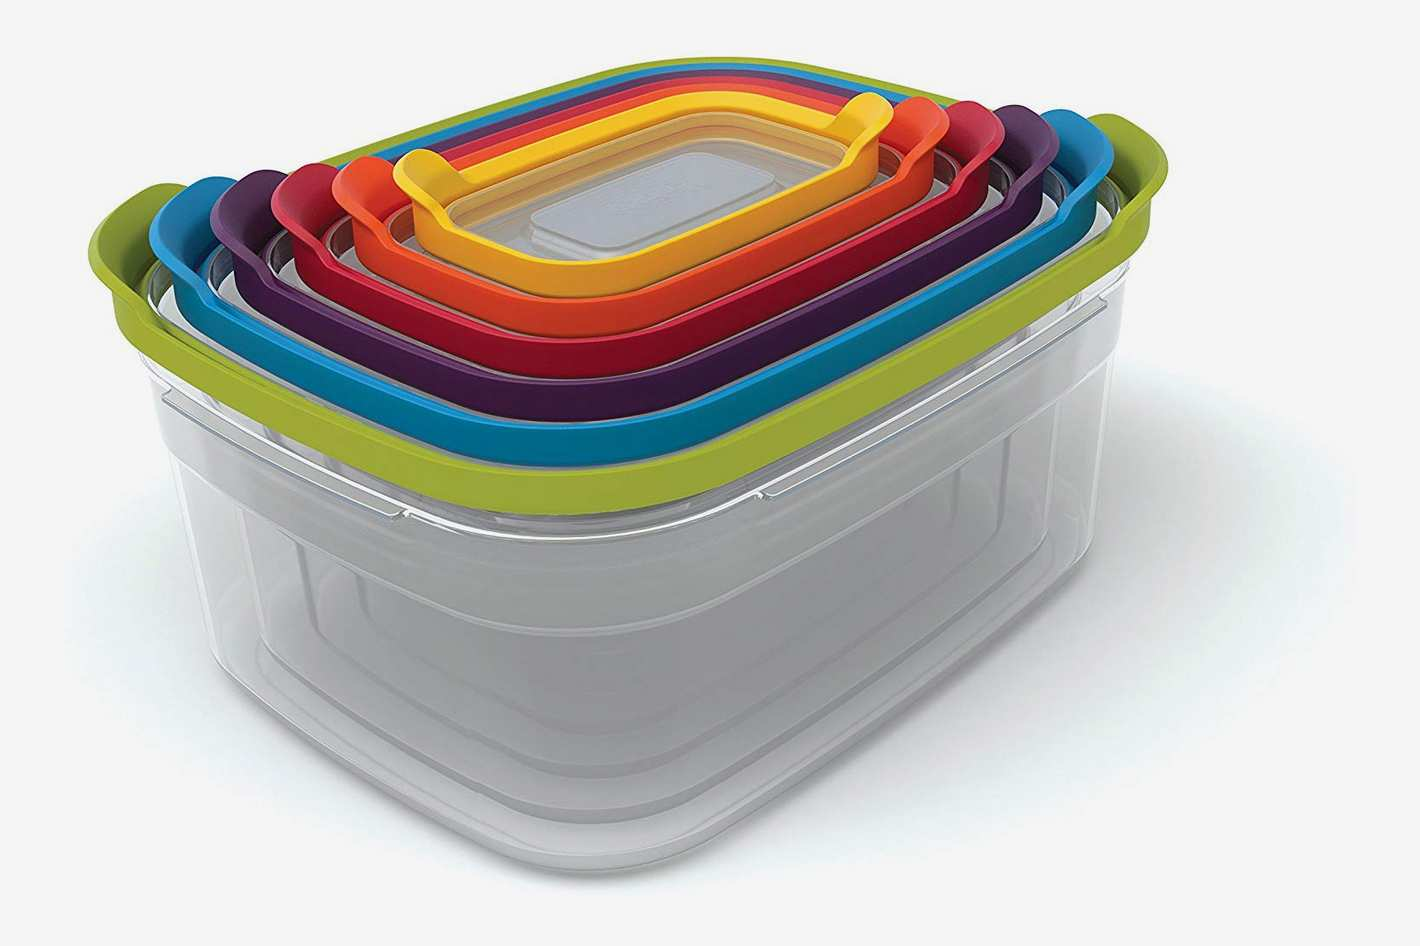 Joseph Joseph Nest 12-Piece Food Storage Container Set